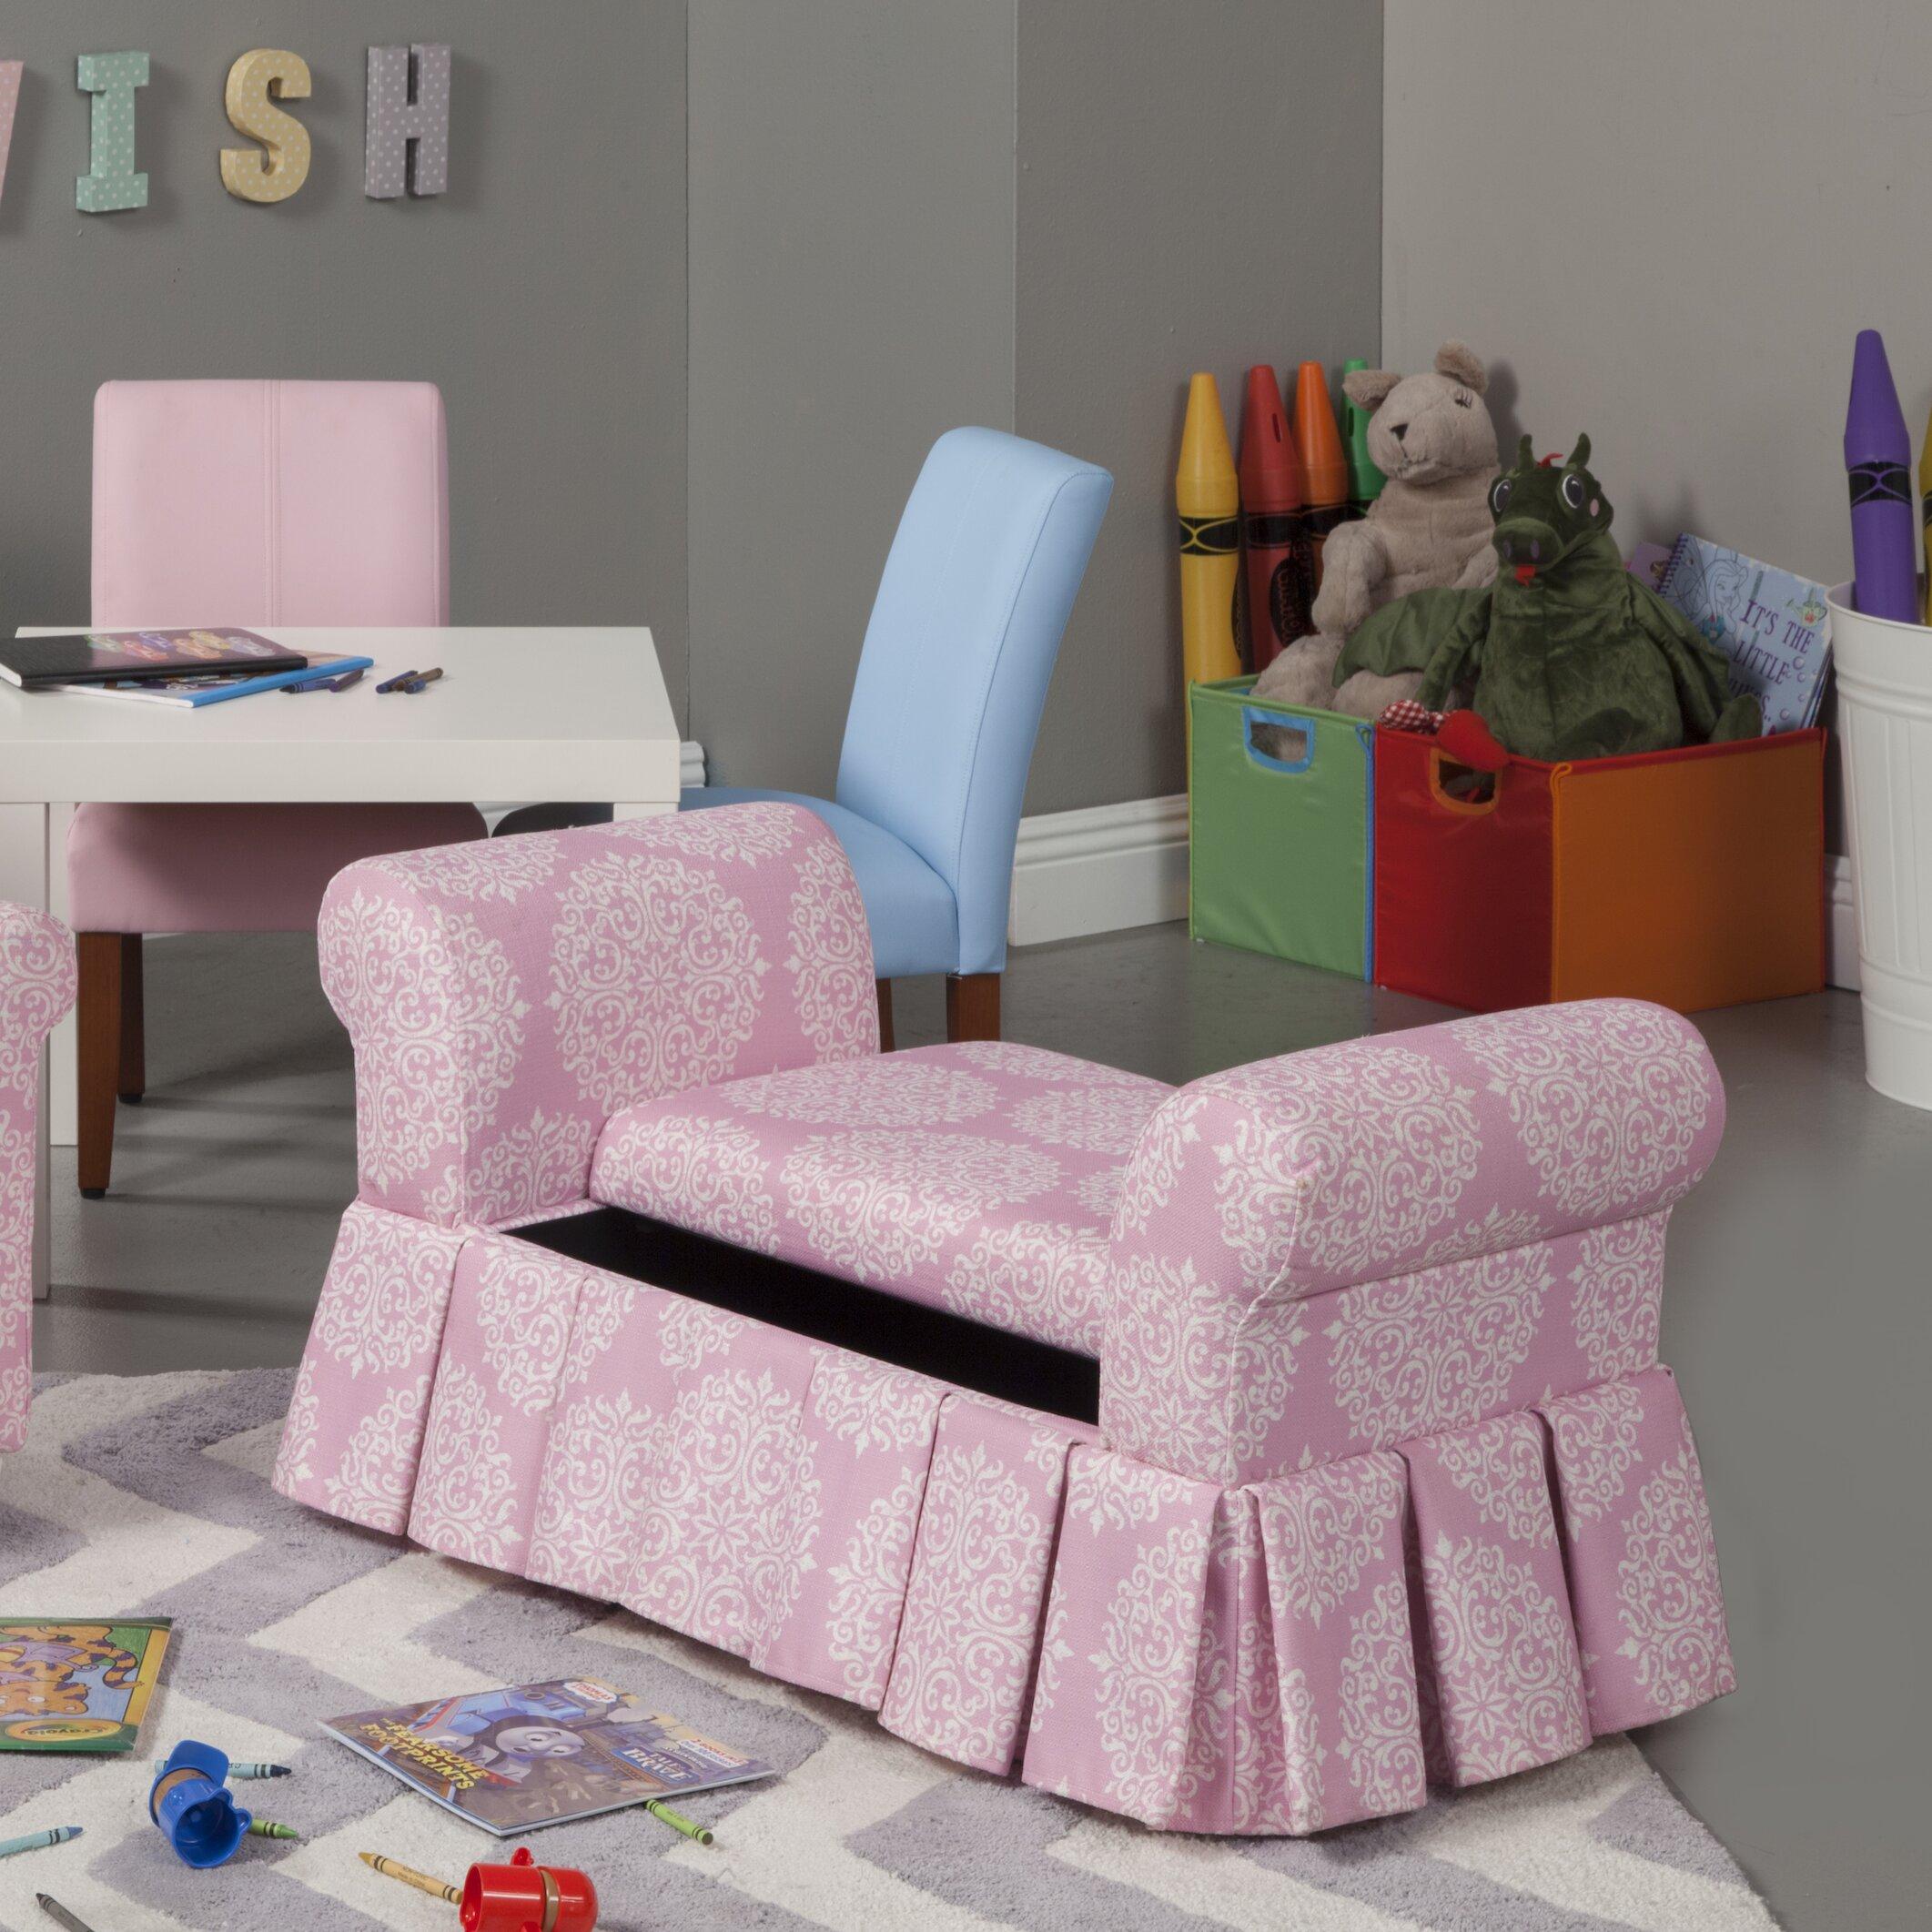 Homepop Juvenile Kids Bedroom Bench With Storage